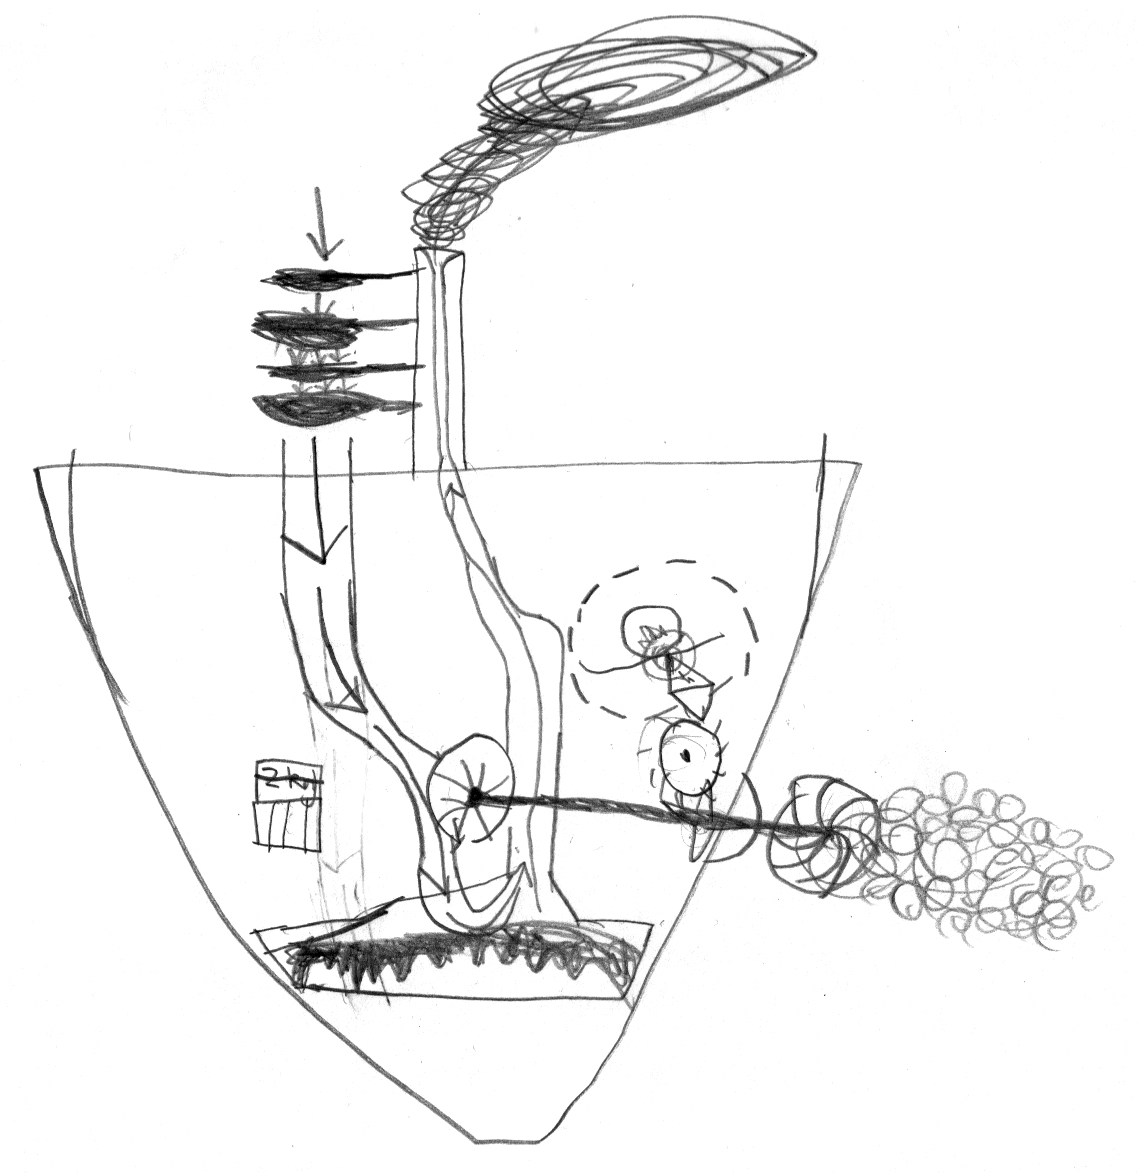 Rewiring Jet Boat Need Input On Wiring Diagram readingratnet – Jet Boat Wiring Diagram